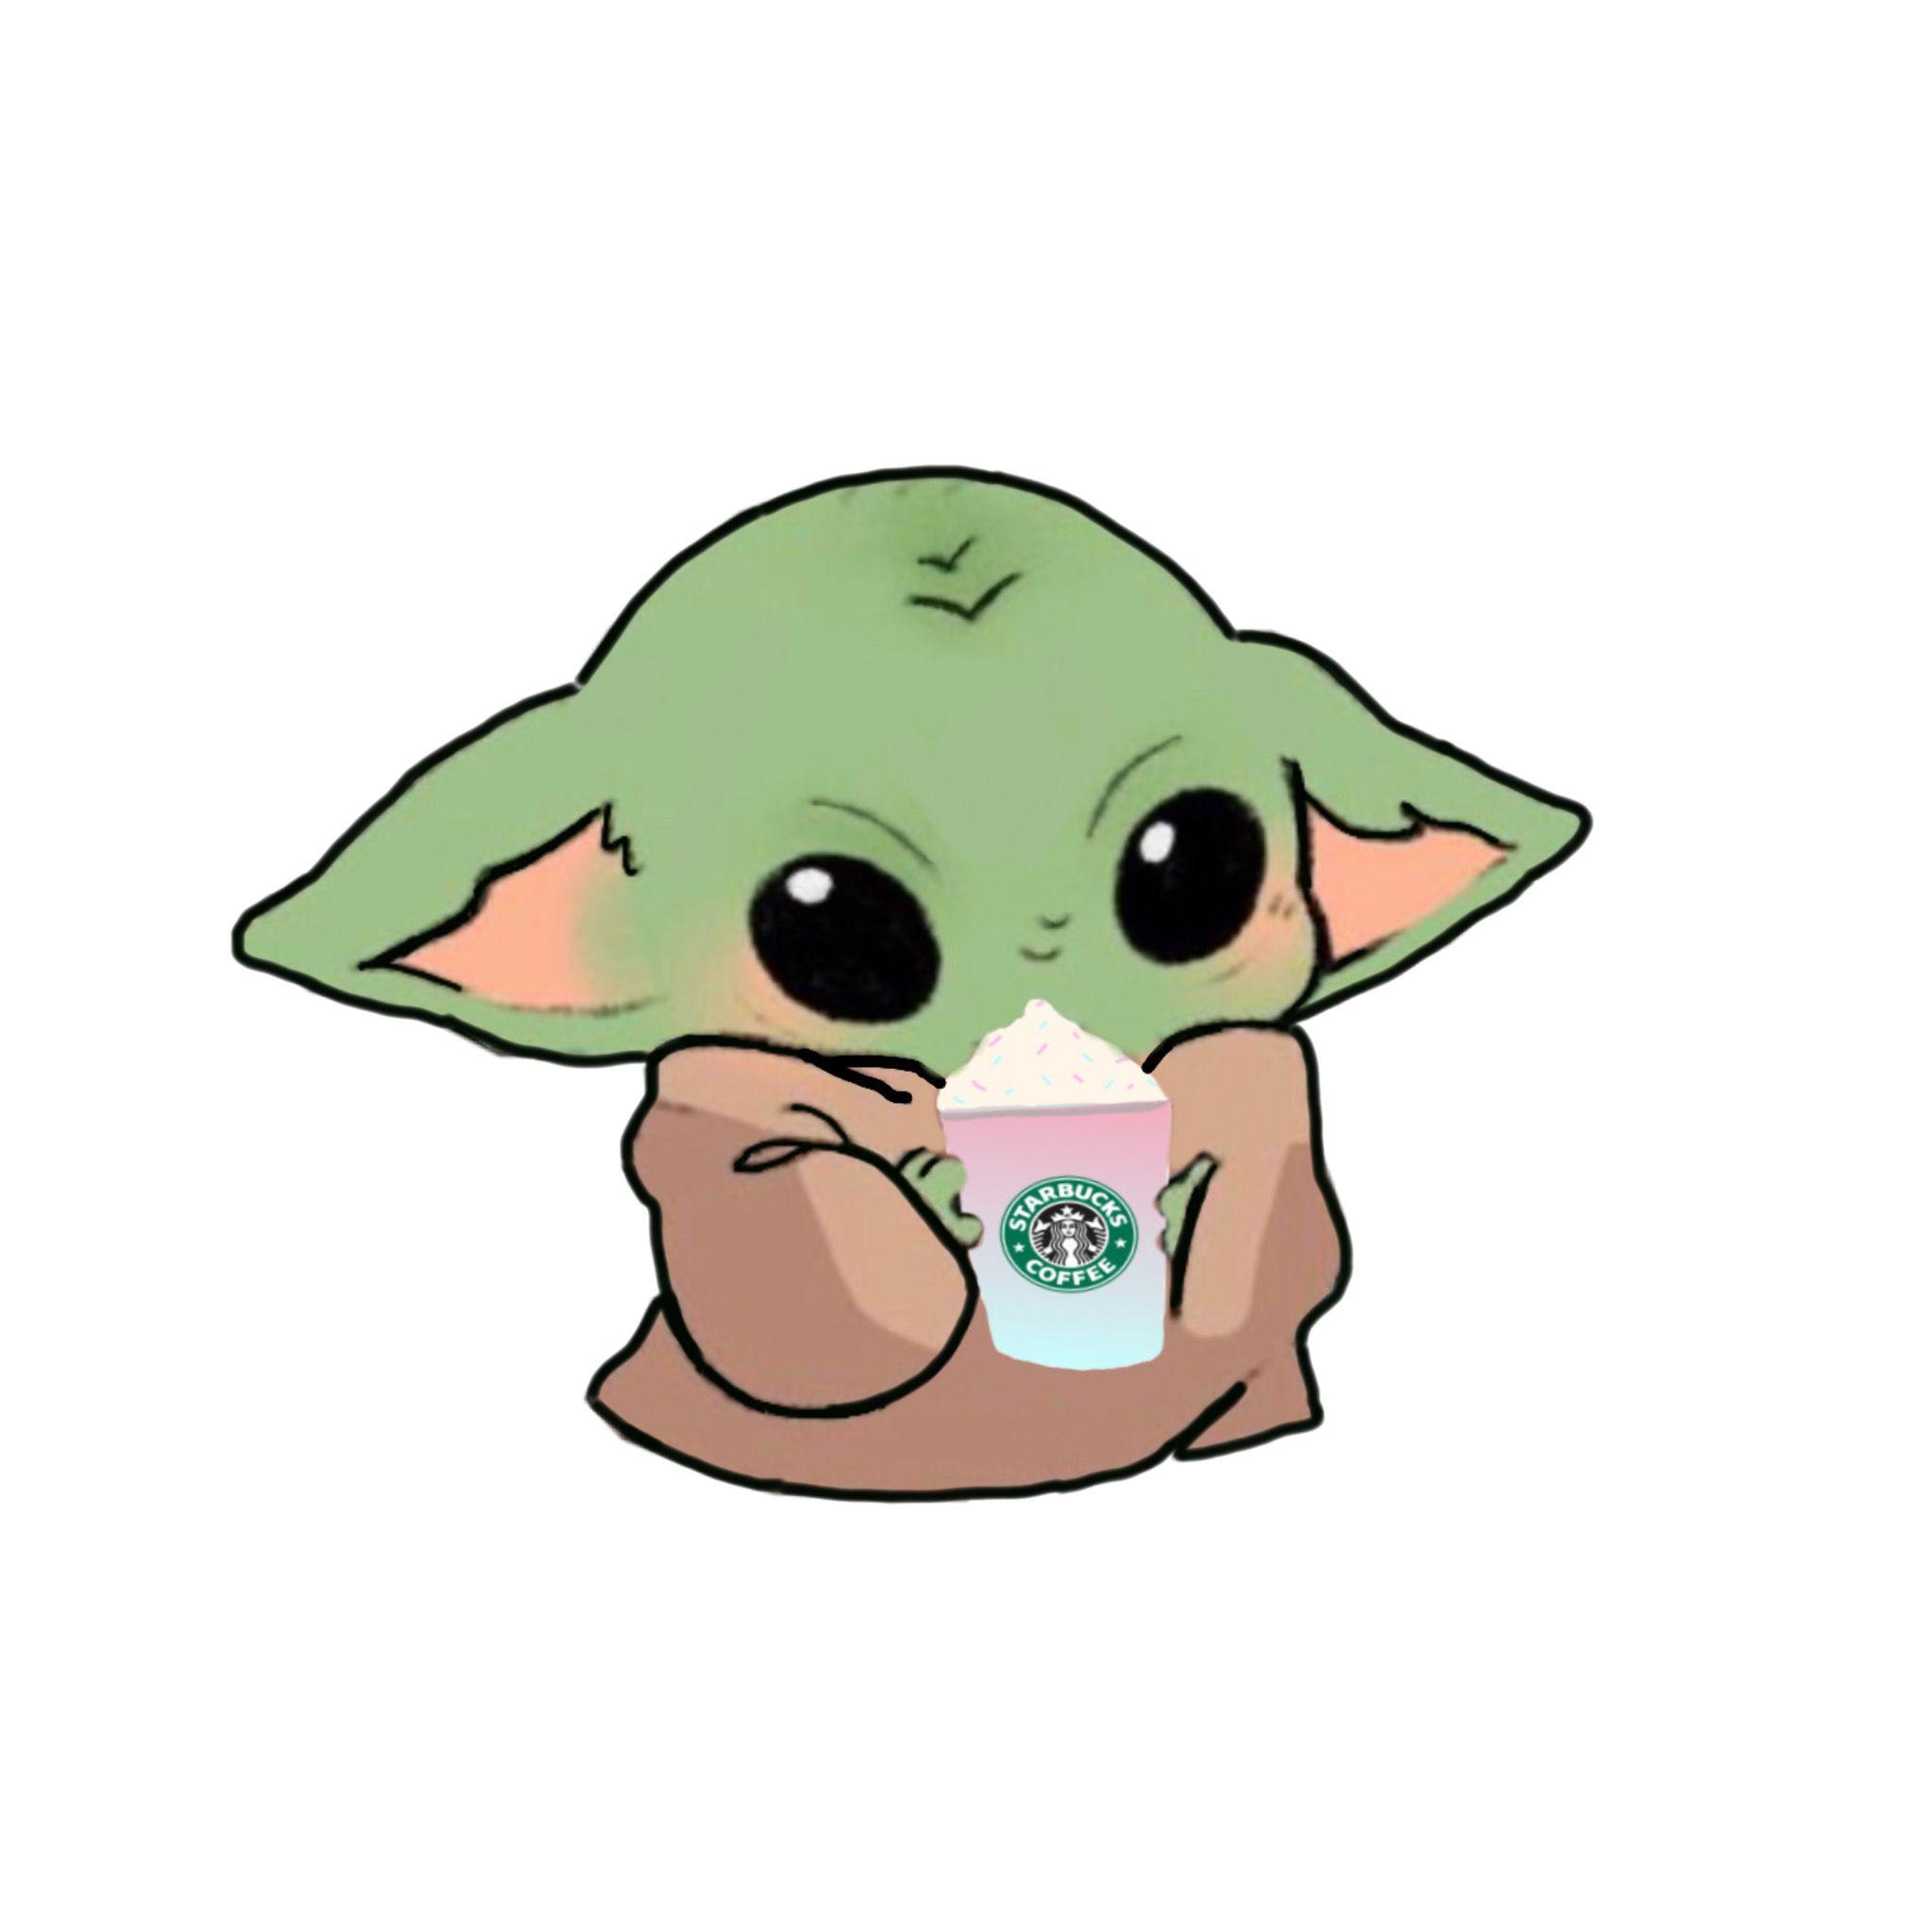 Baby Yoda Yoda Wallpaper Cute Disney Wallpaper Cute Cartoon Wallpapers